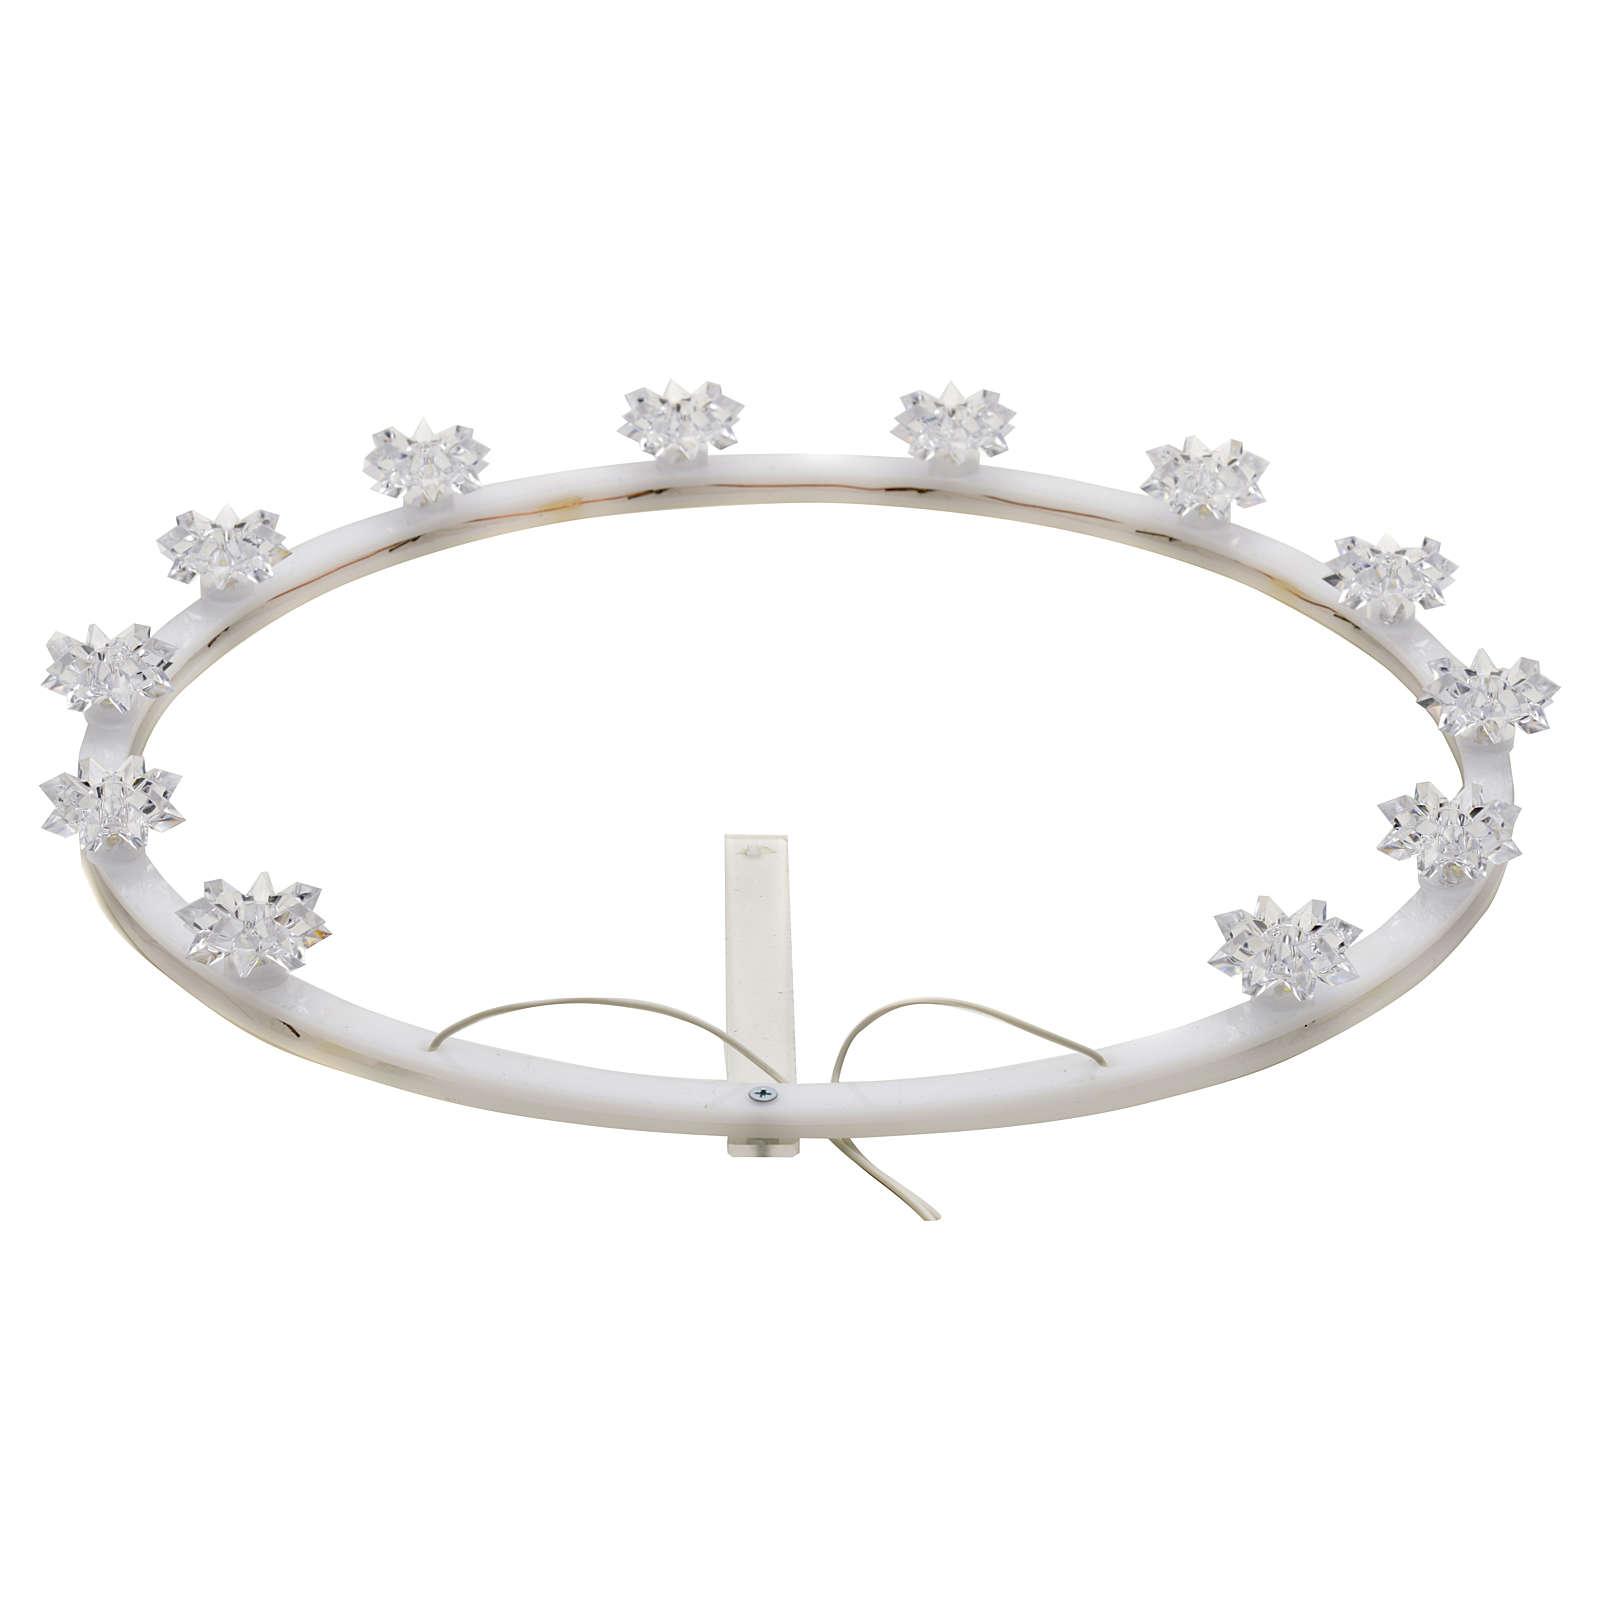 Plexiglas luminous halo with flowers 3